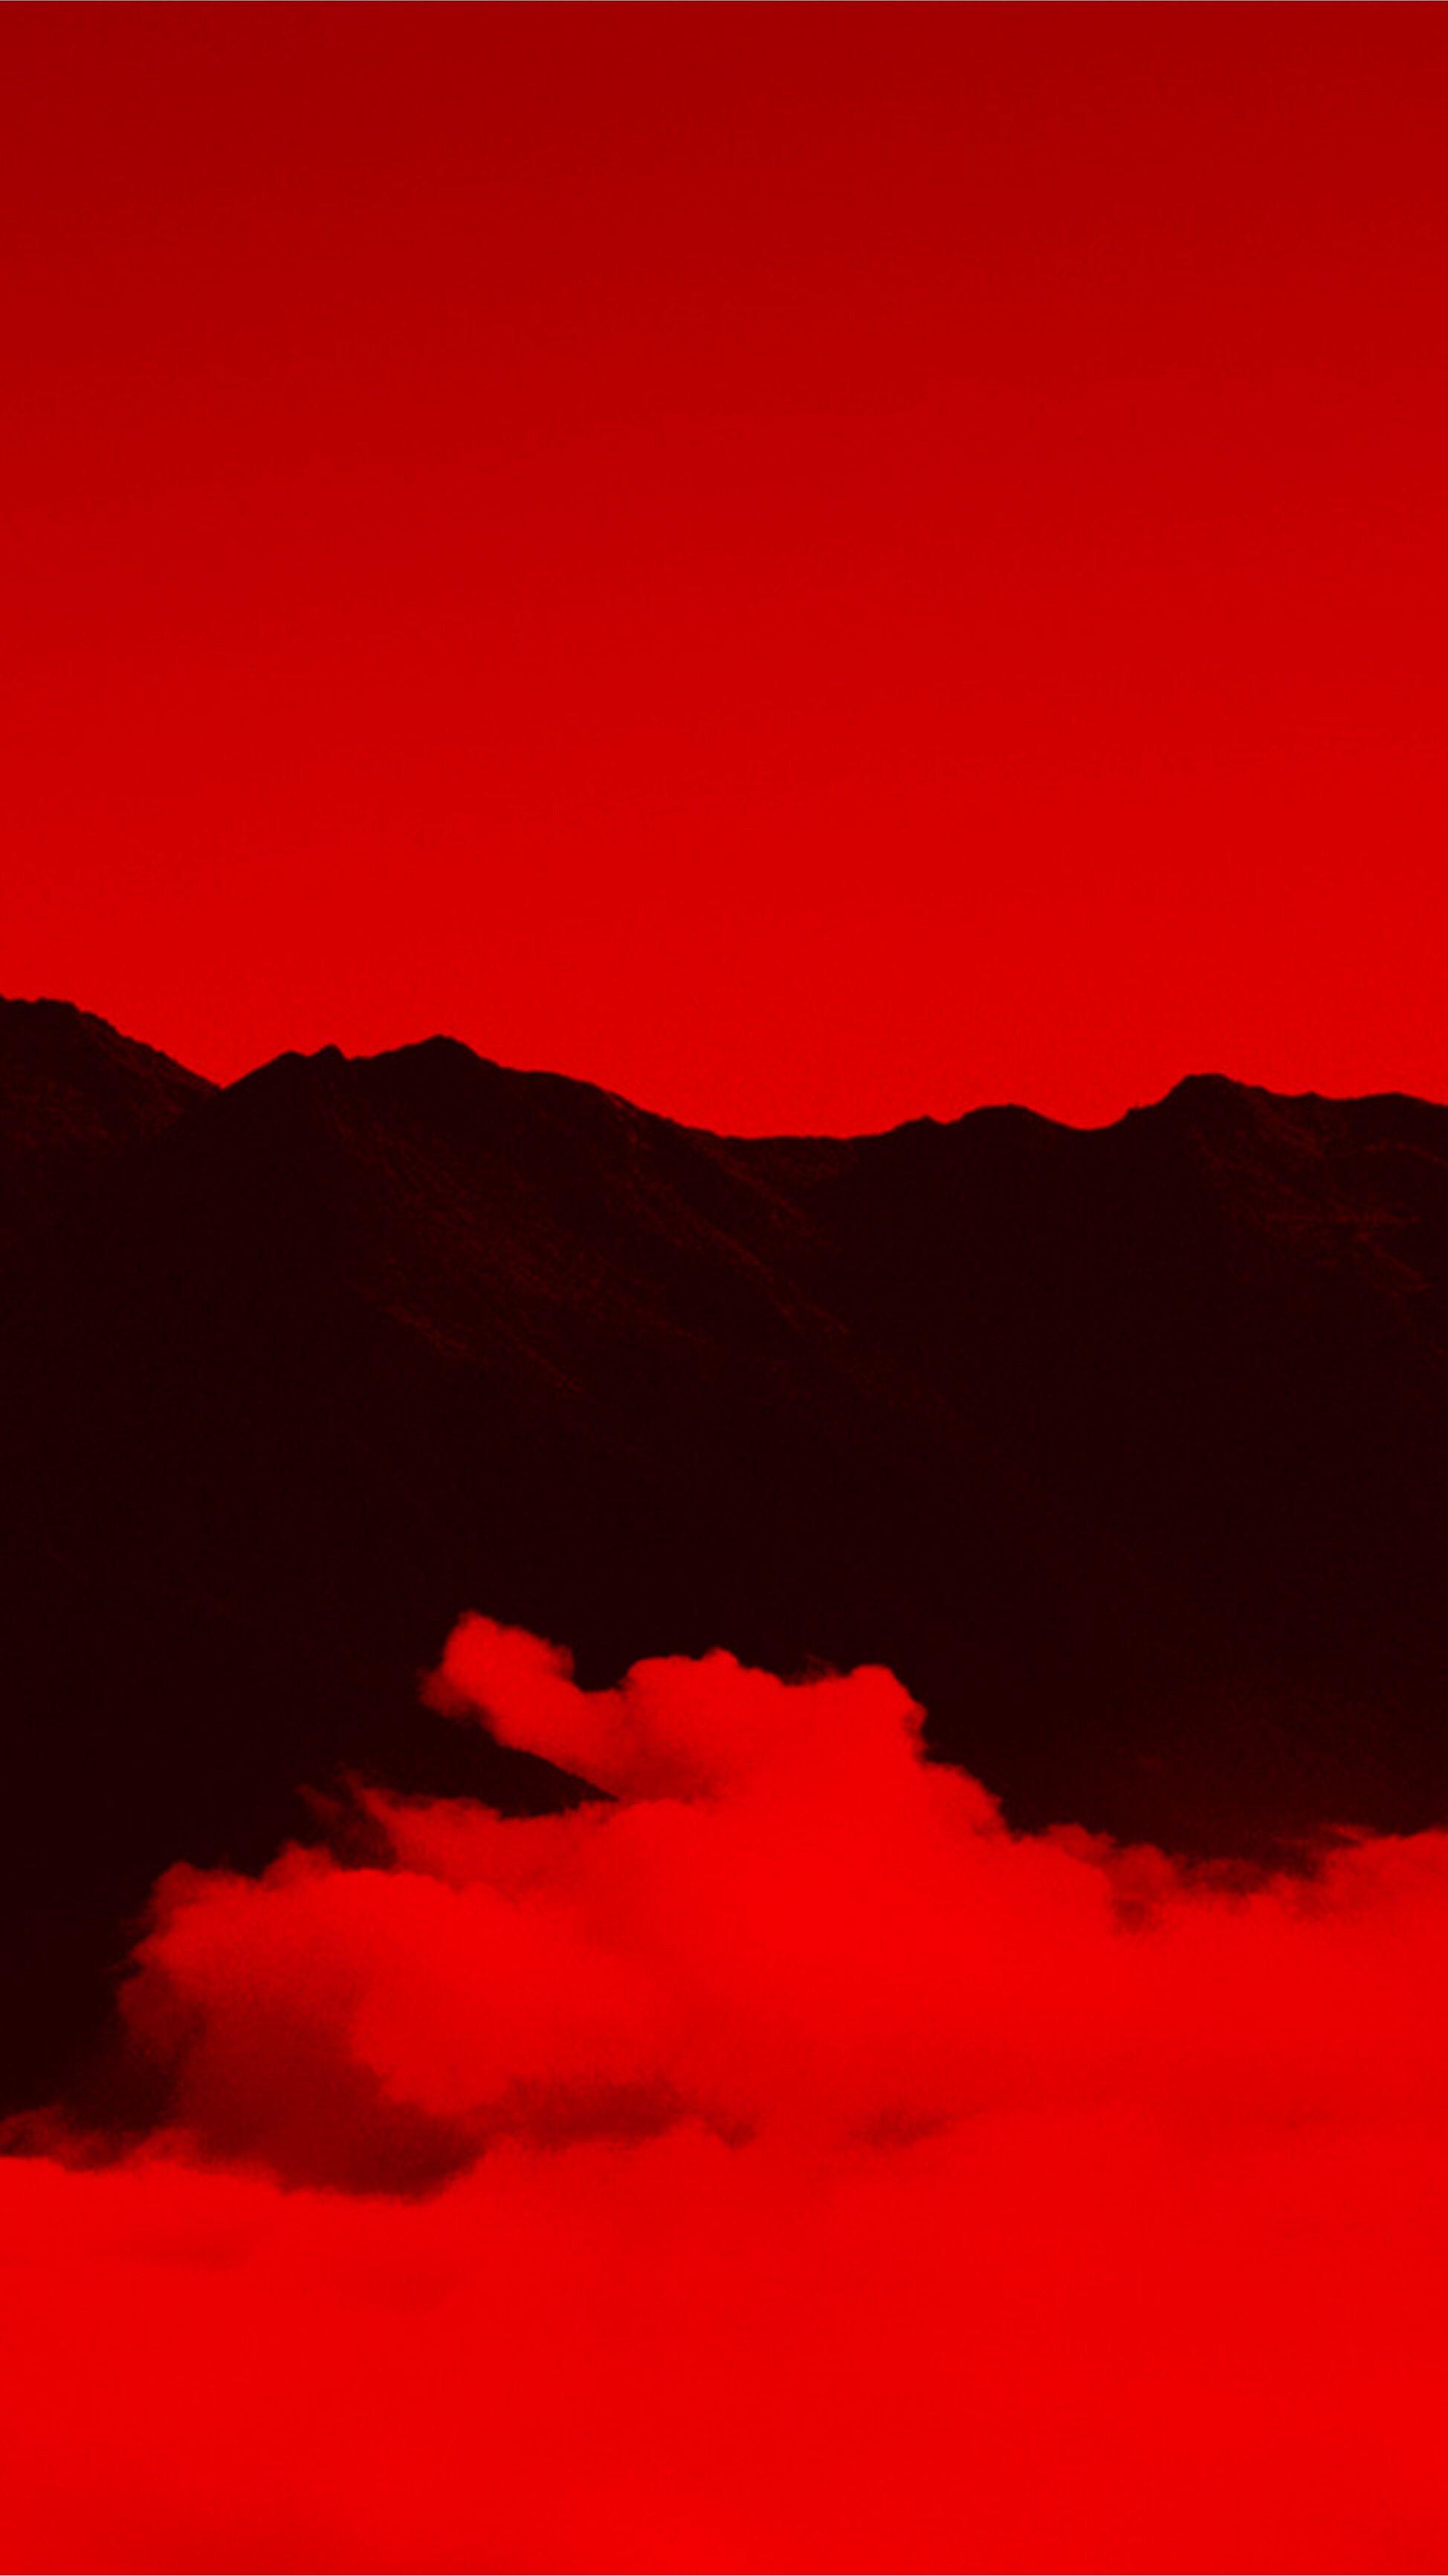 Wallpaper Wallpaper Background Wallpaperbackground Red Dark Red Wallpaper Red Wallpaper Red Aesthetic